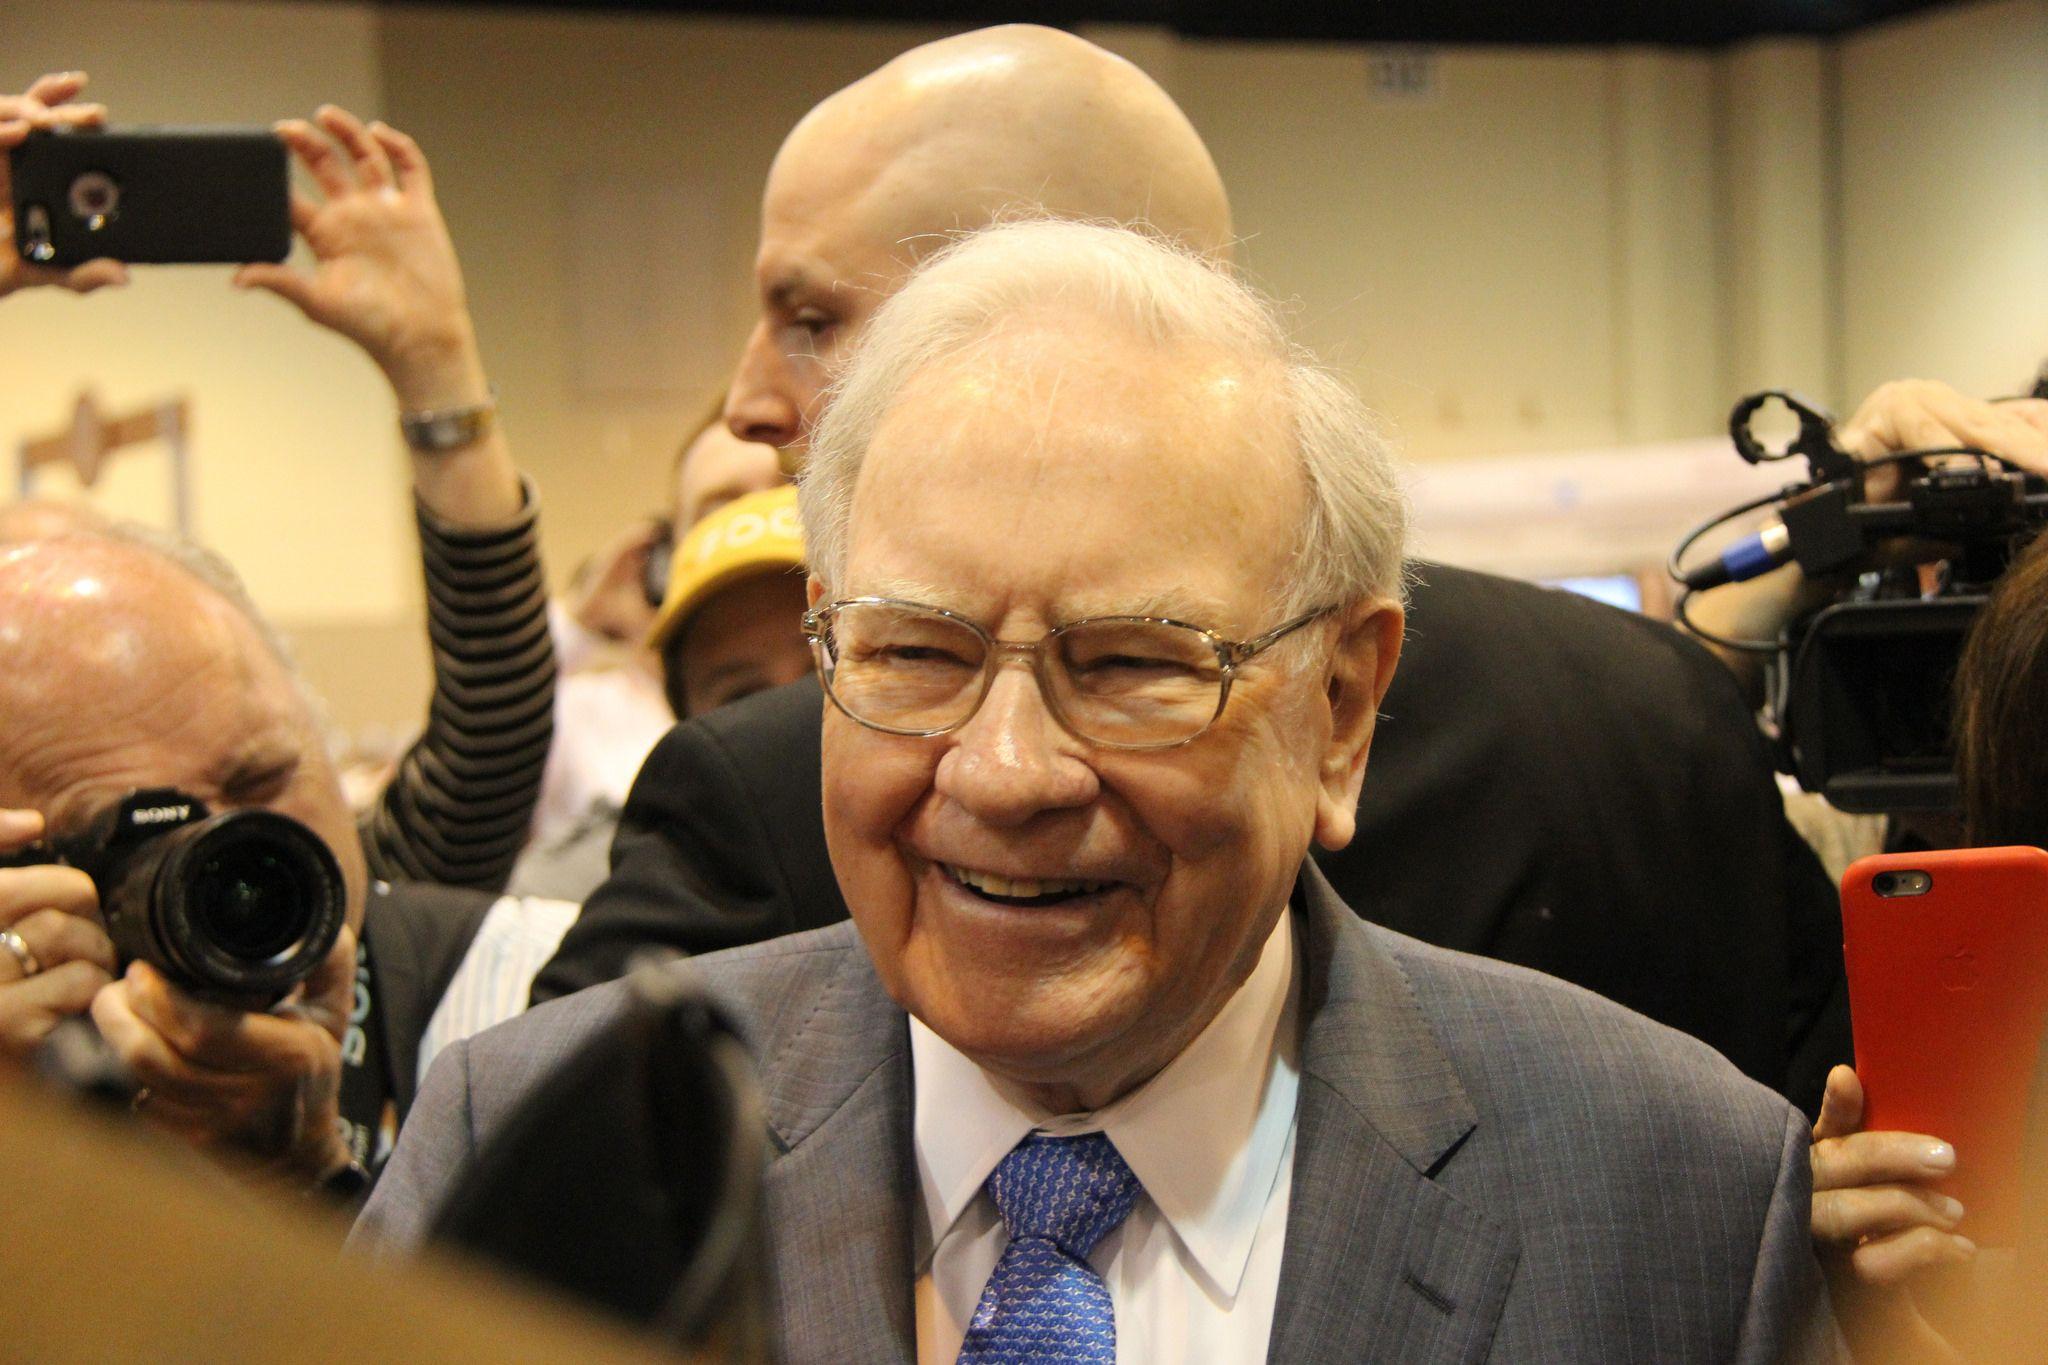 Warren Buffett surrounded by photographers